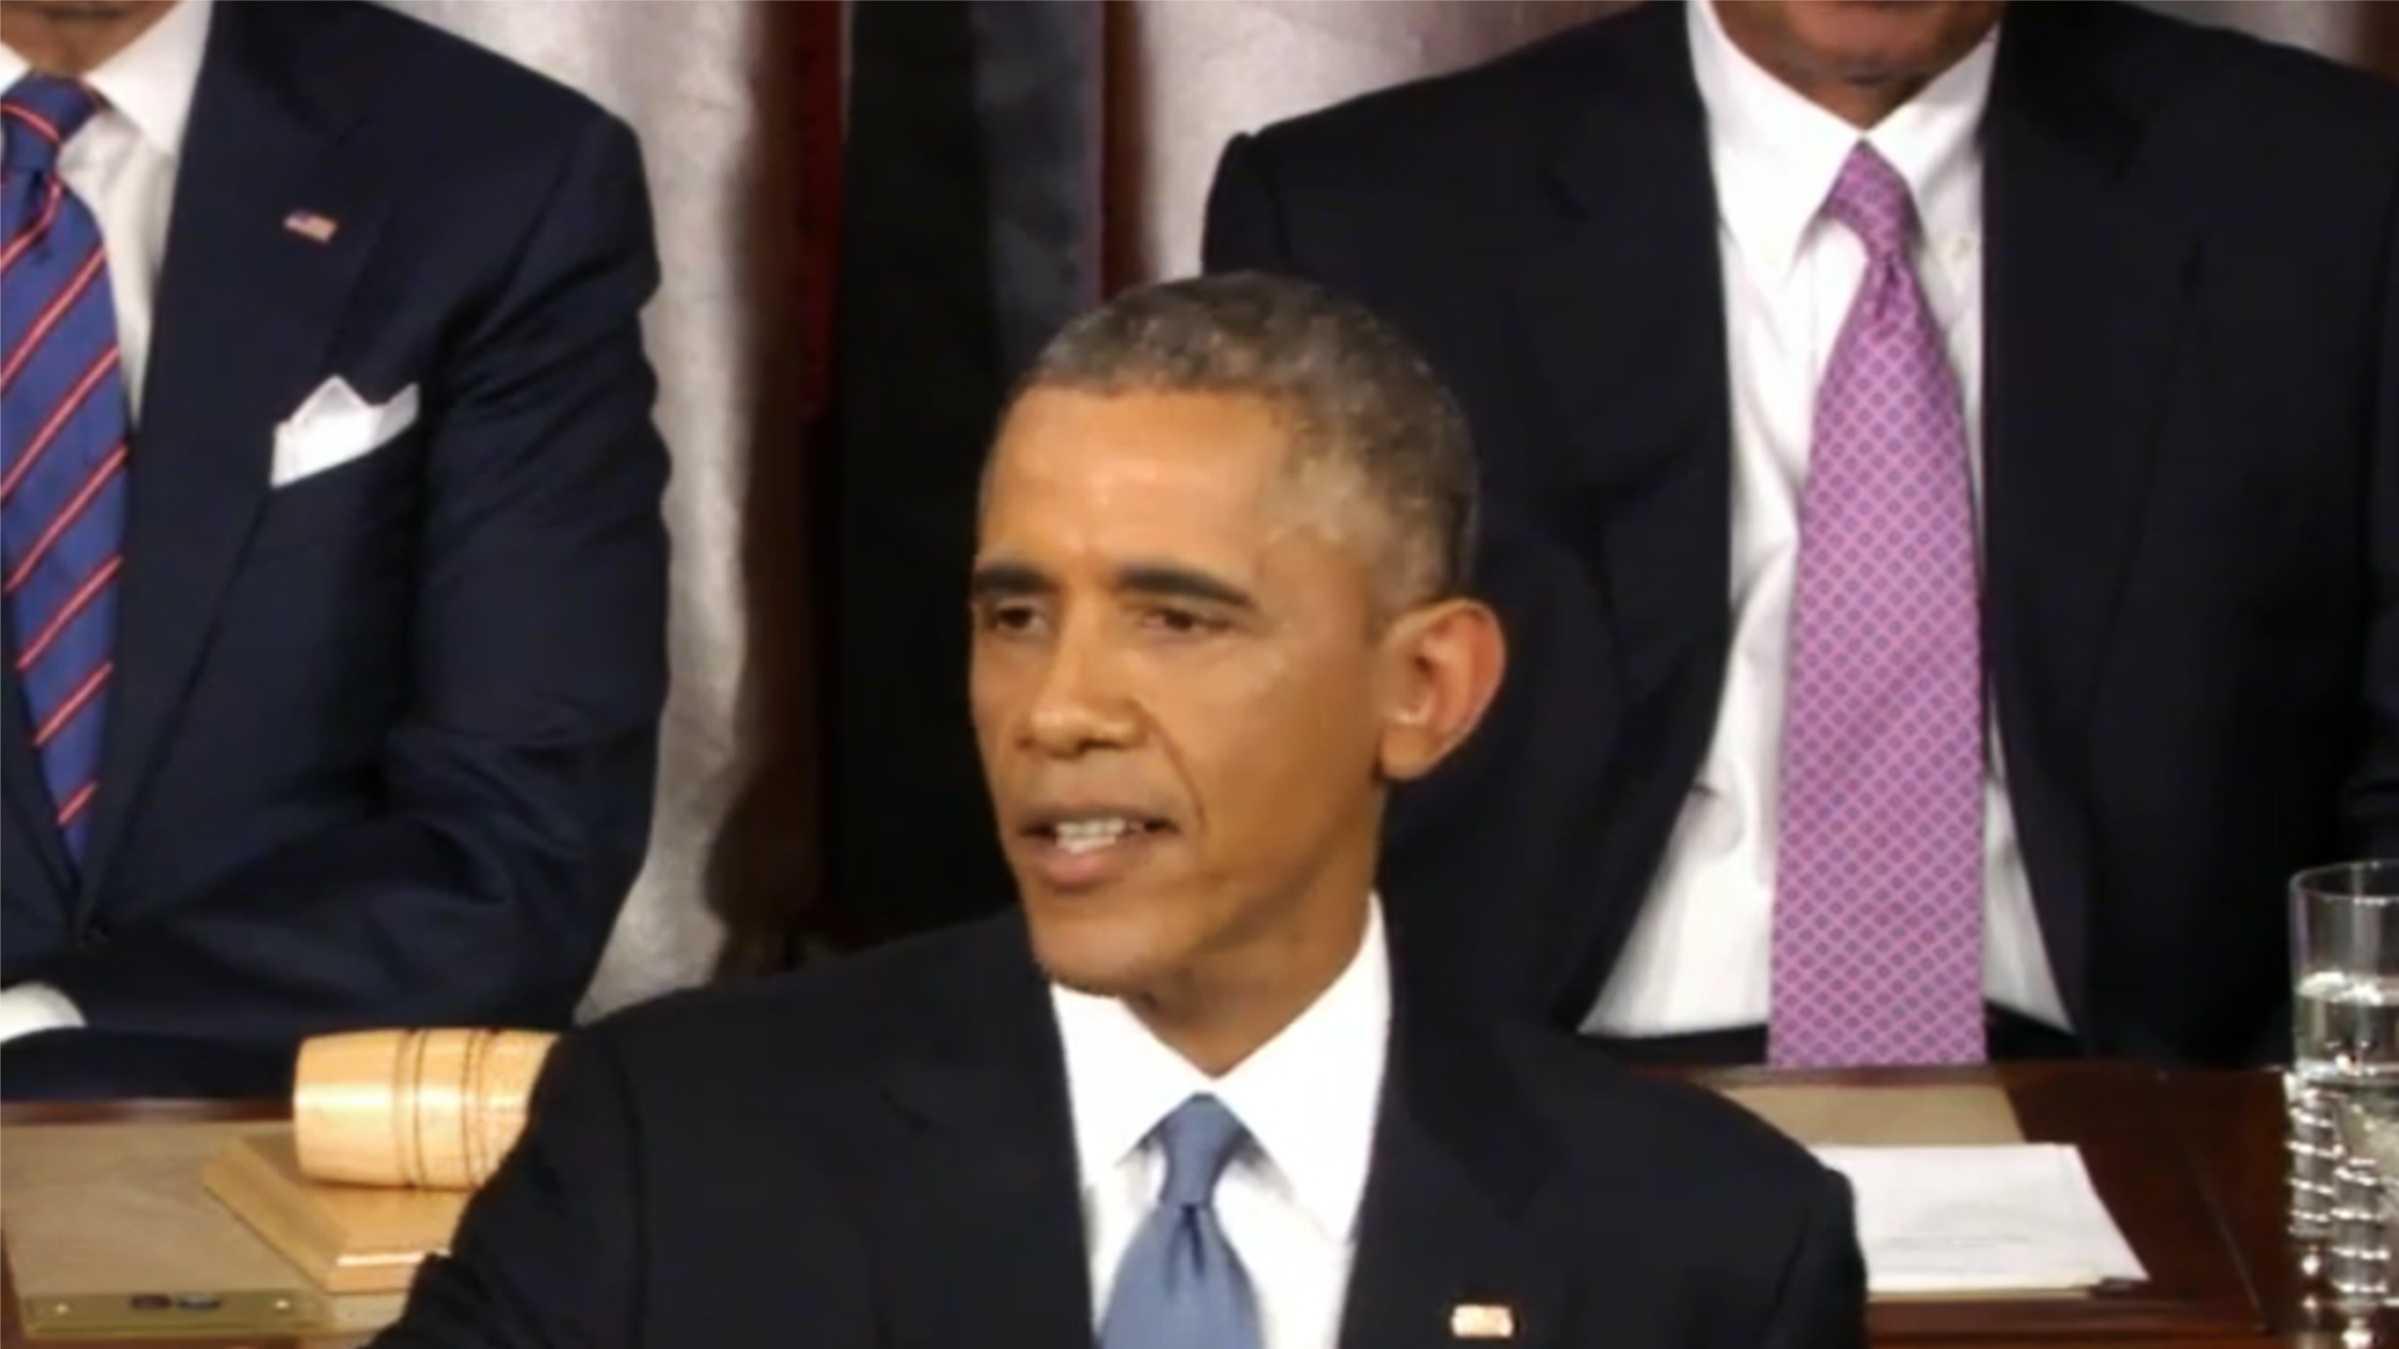 President Barack Obama (Jan. 20, 2015)